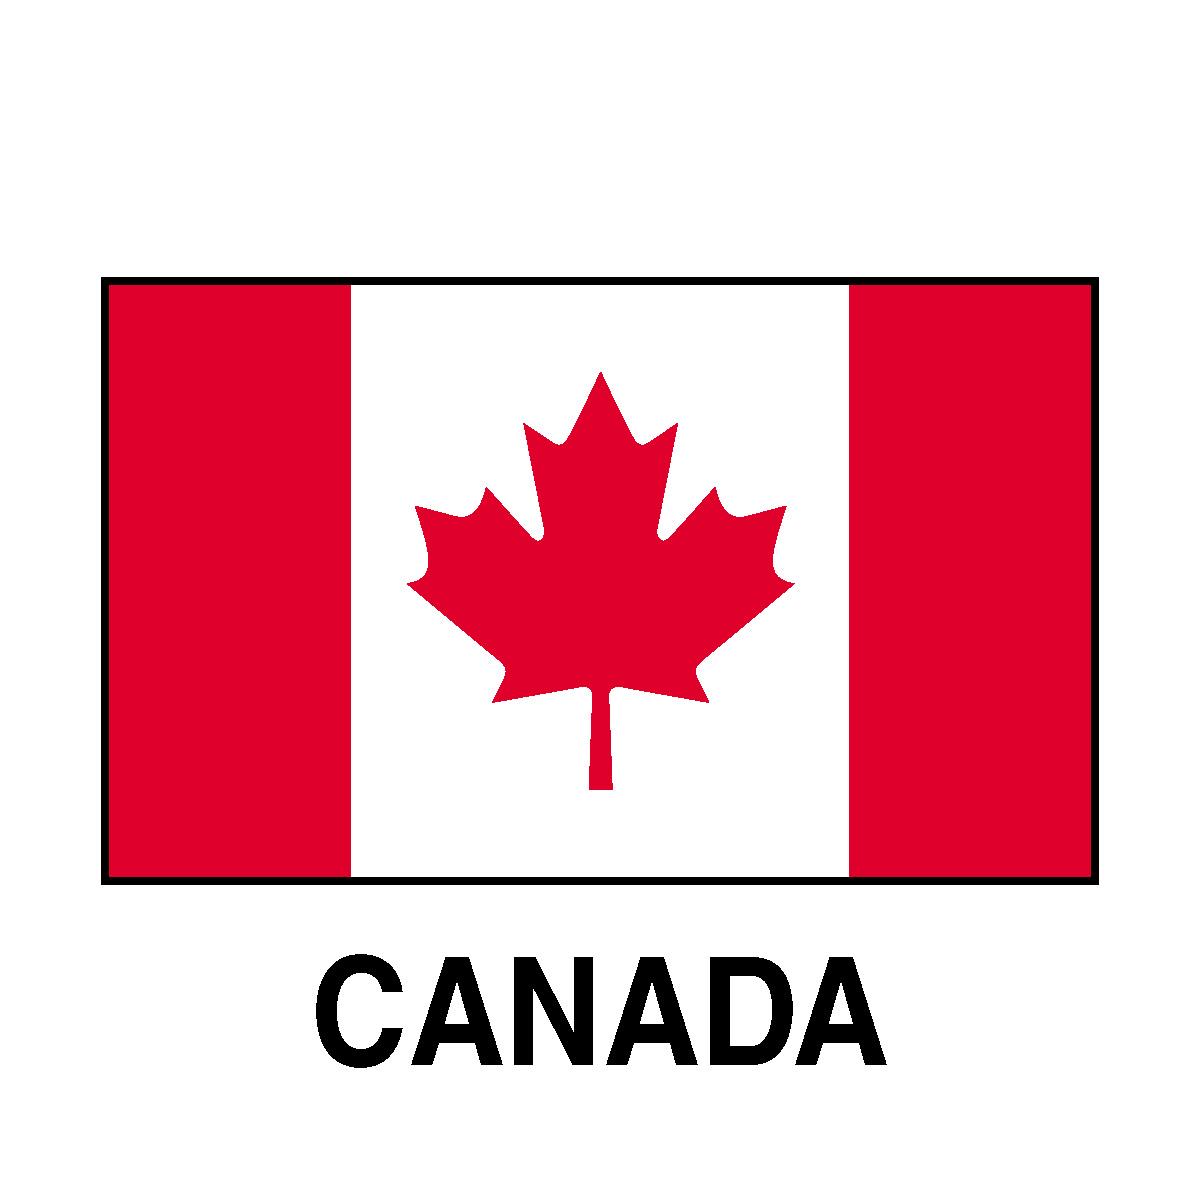 Canada flag clipart